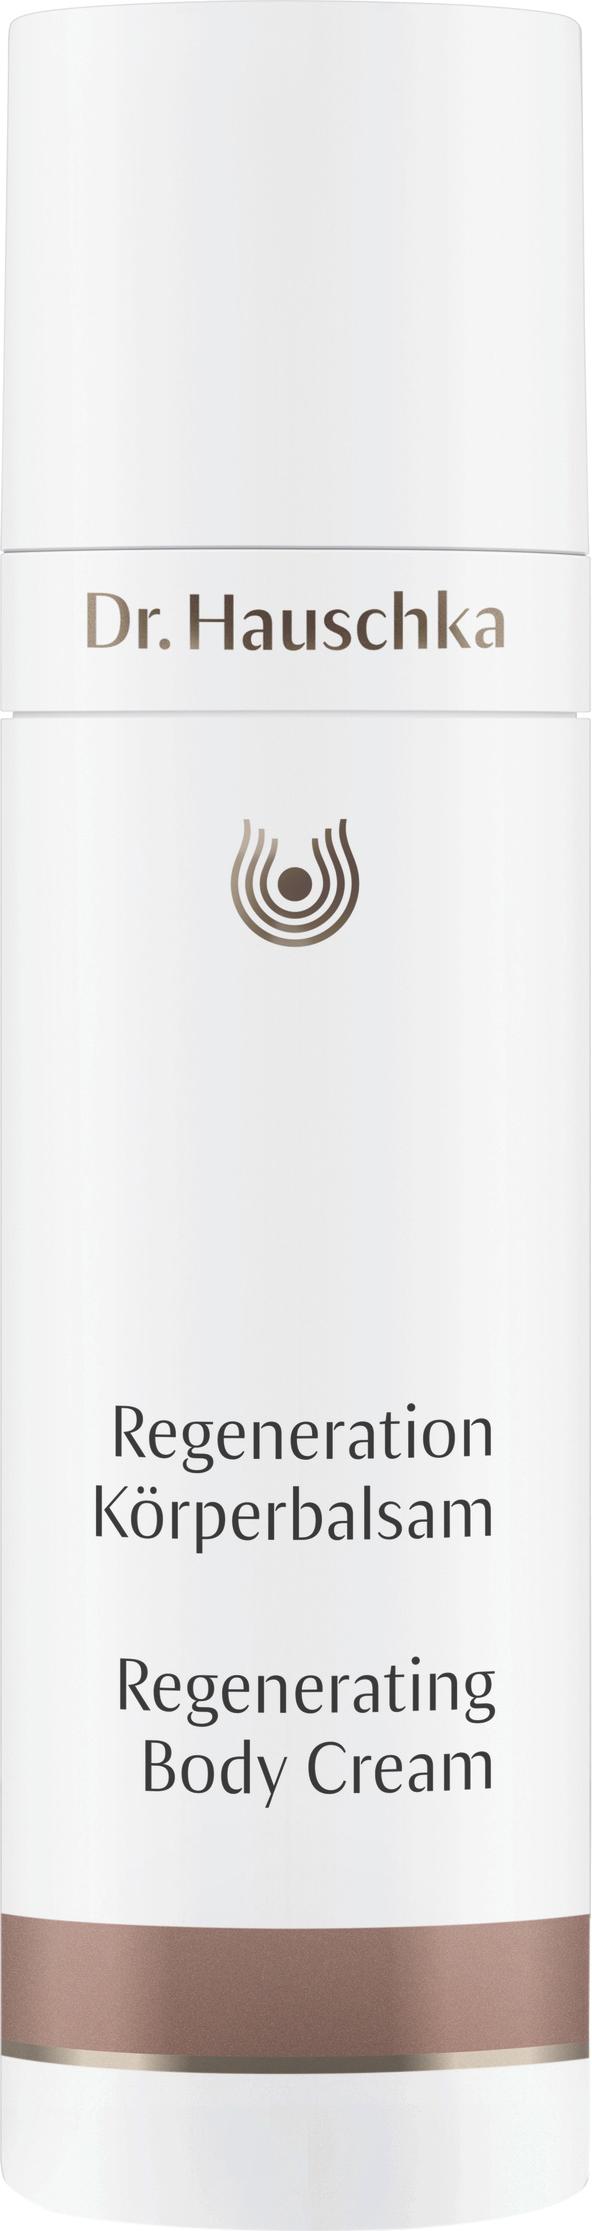 Dr. Hauschka - Regenerating Body Cream 150 ml